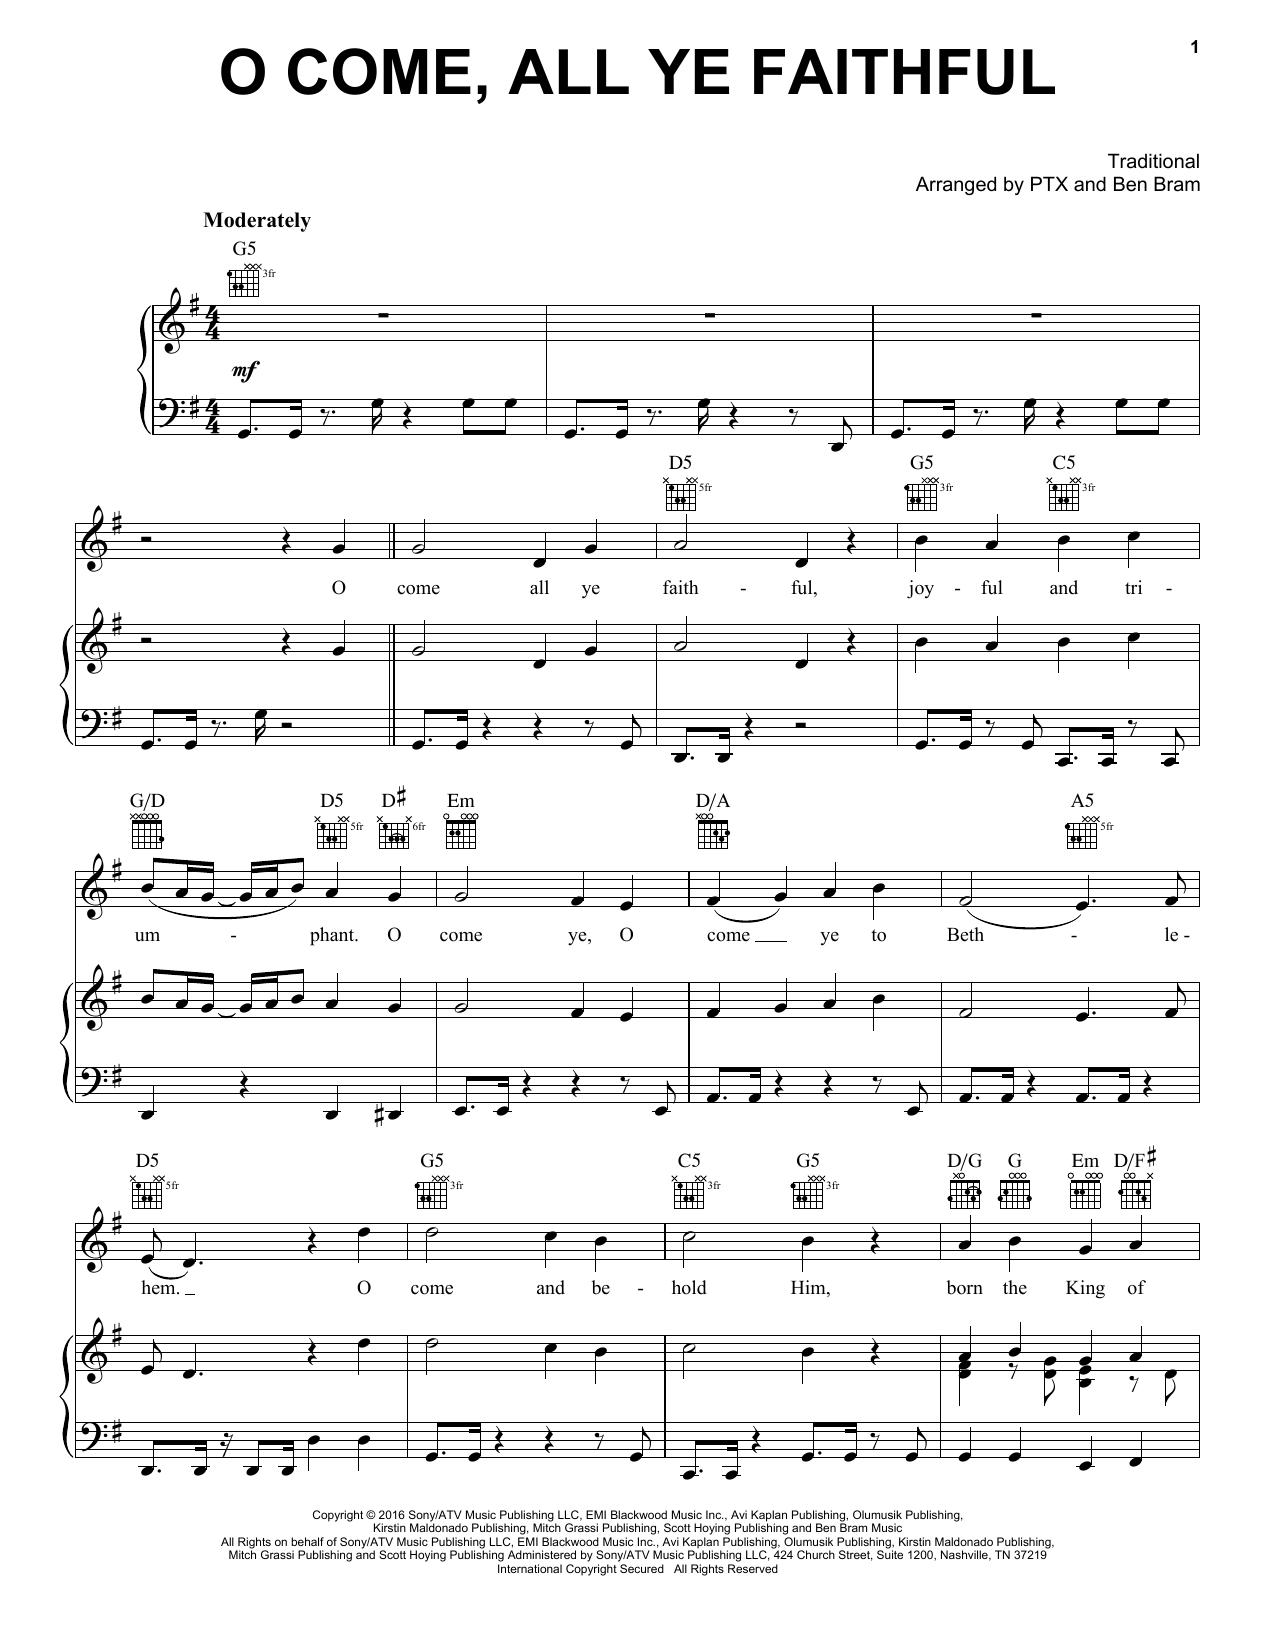 Pentatonix O Come All Ye Faithful Sheet Music Notes Chords